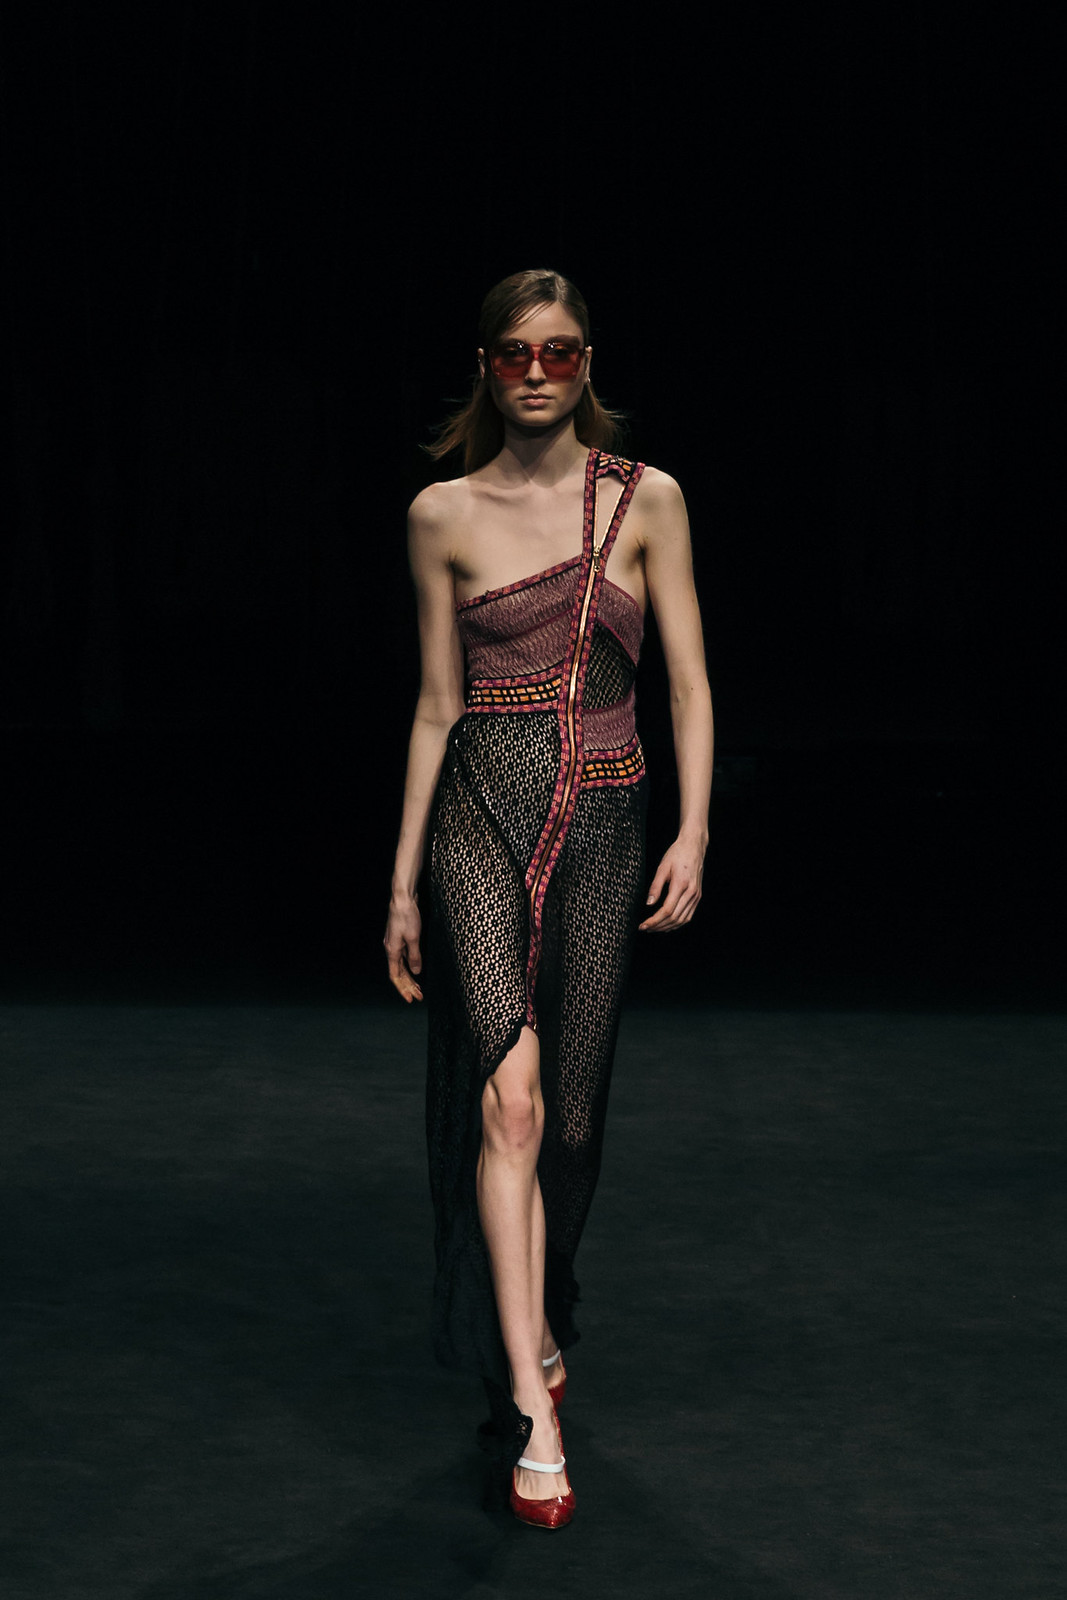 Jessie Chanes - Seams for a desire - 080 Bacelona Fashion #080bcnfasion -16